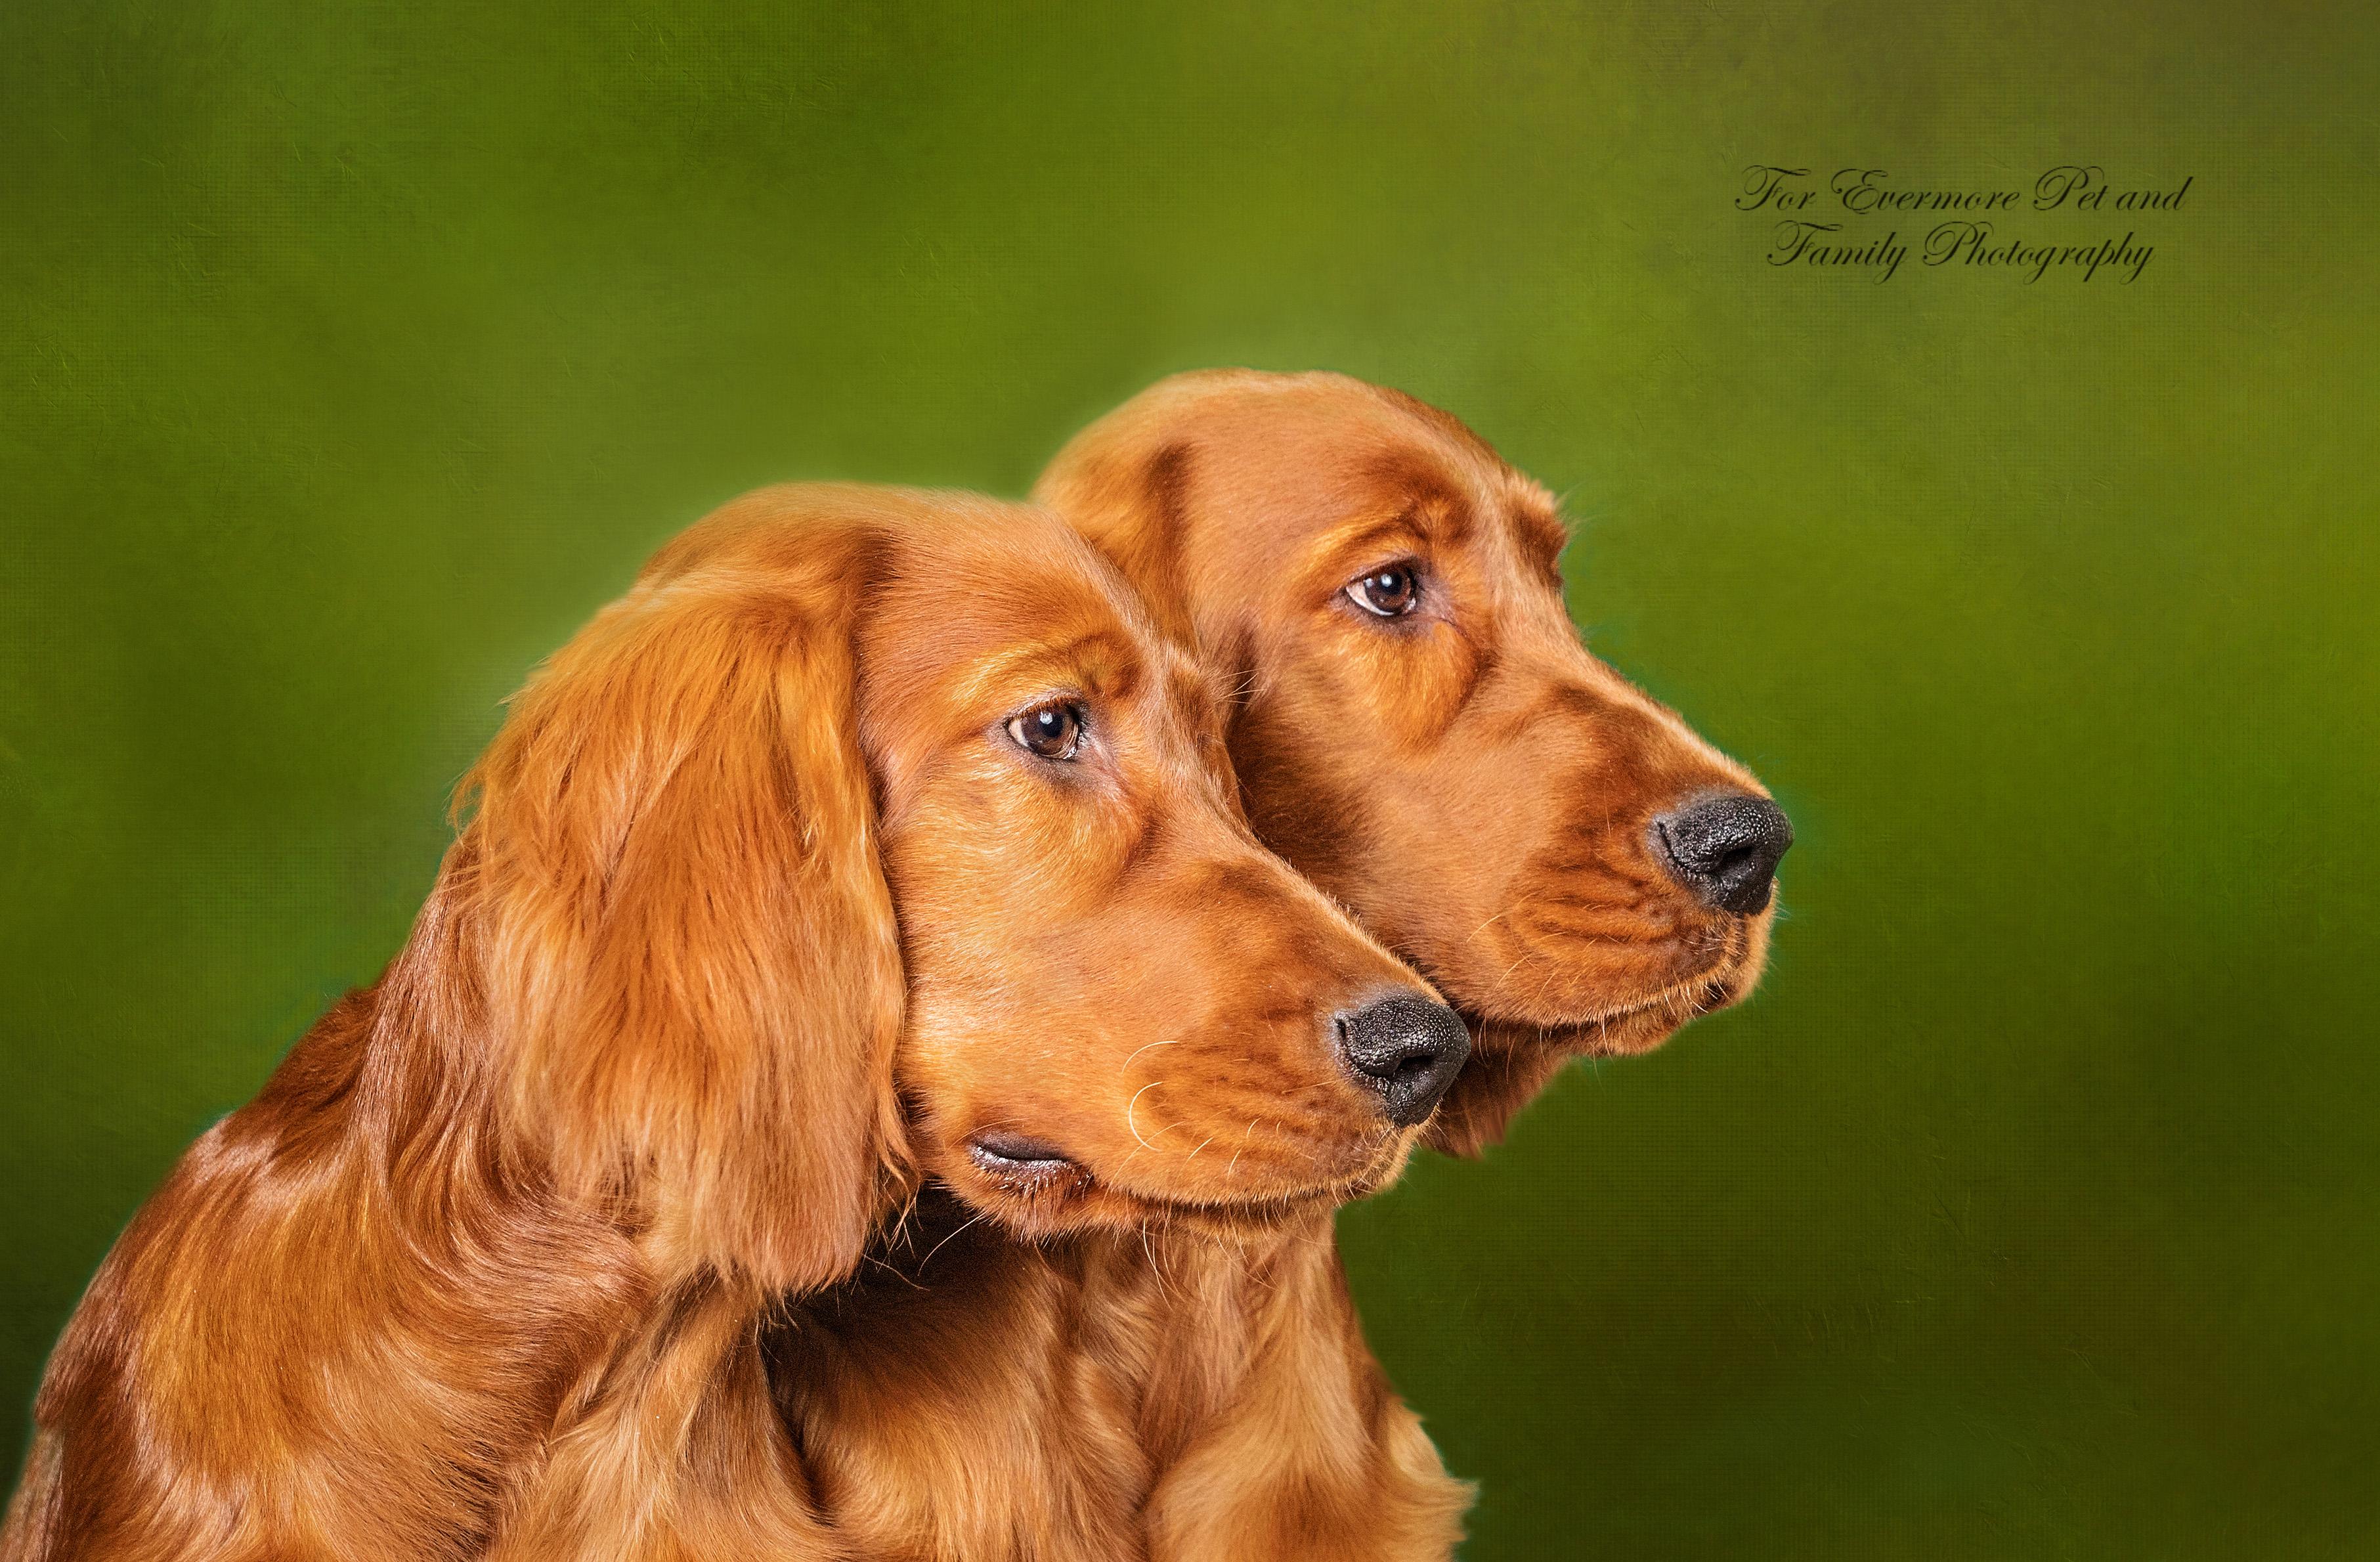 Irish Setter puppies August and Cora